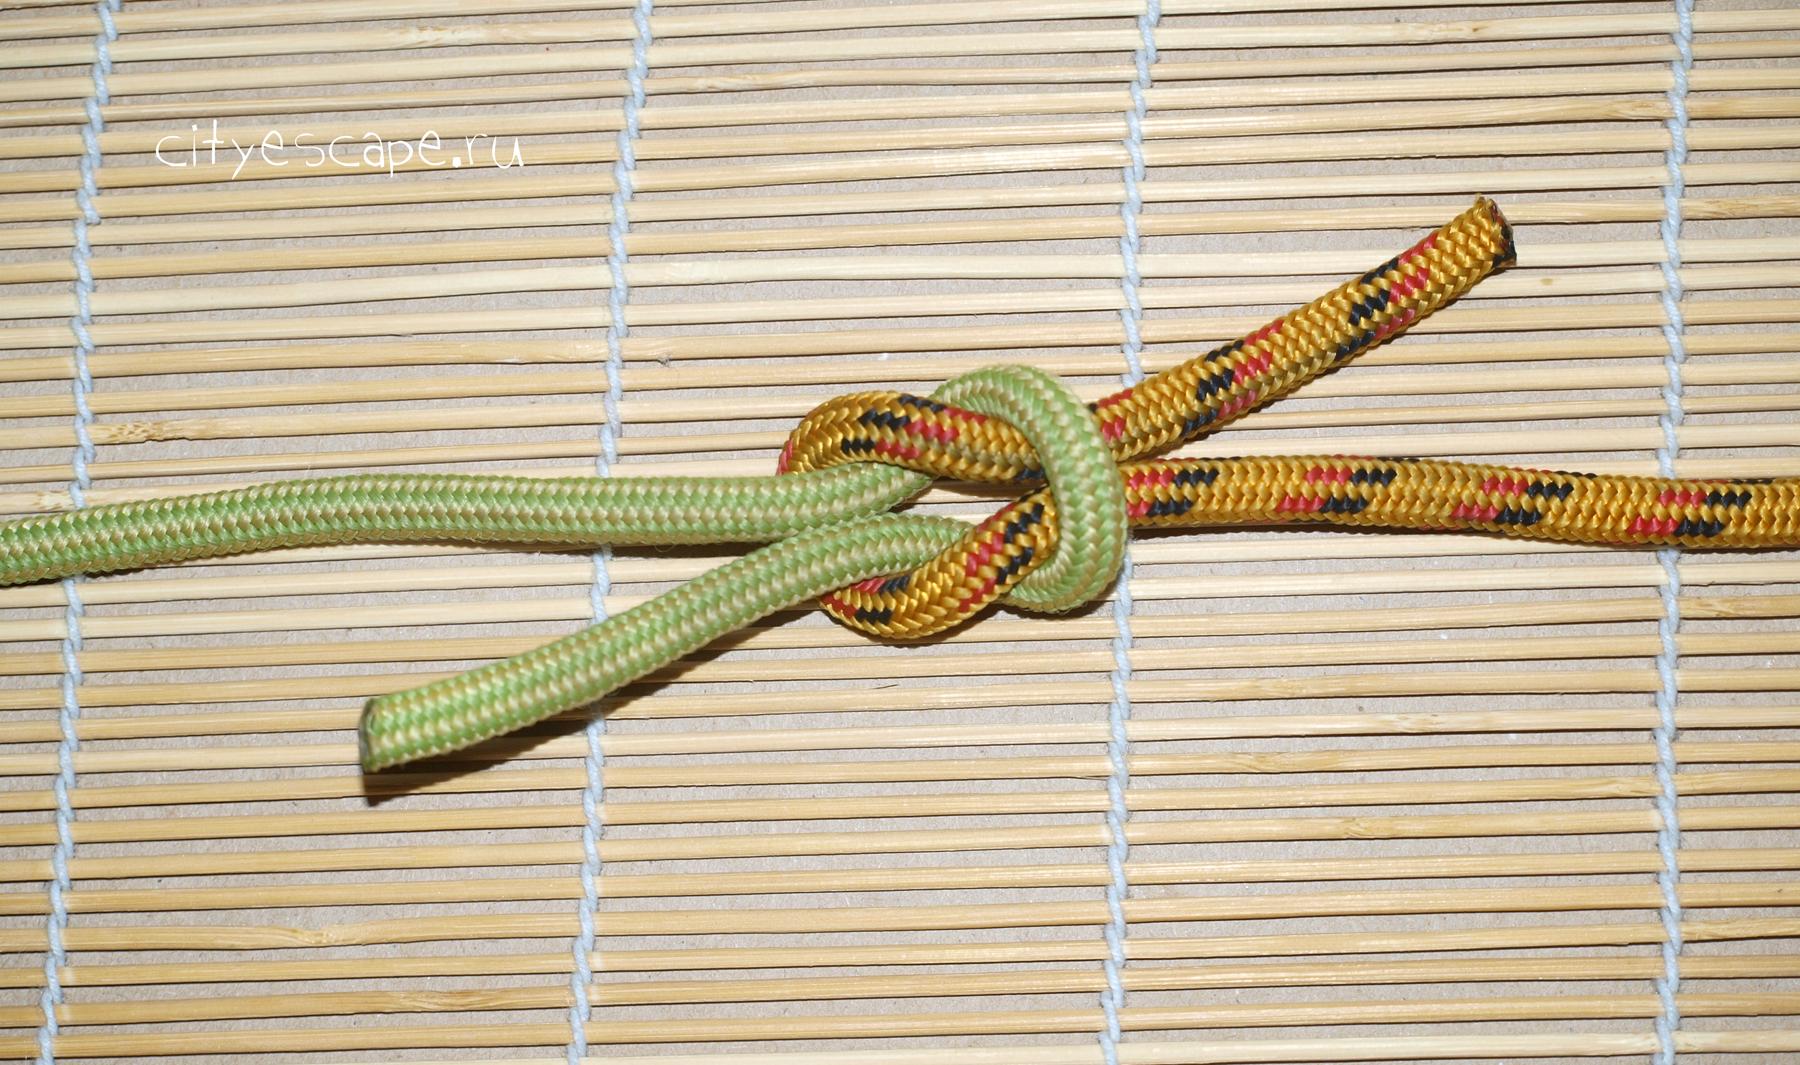 Правильно завязать веревку